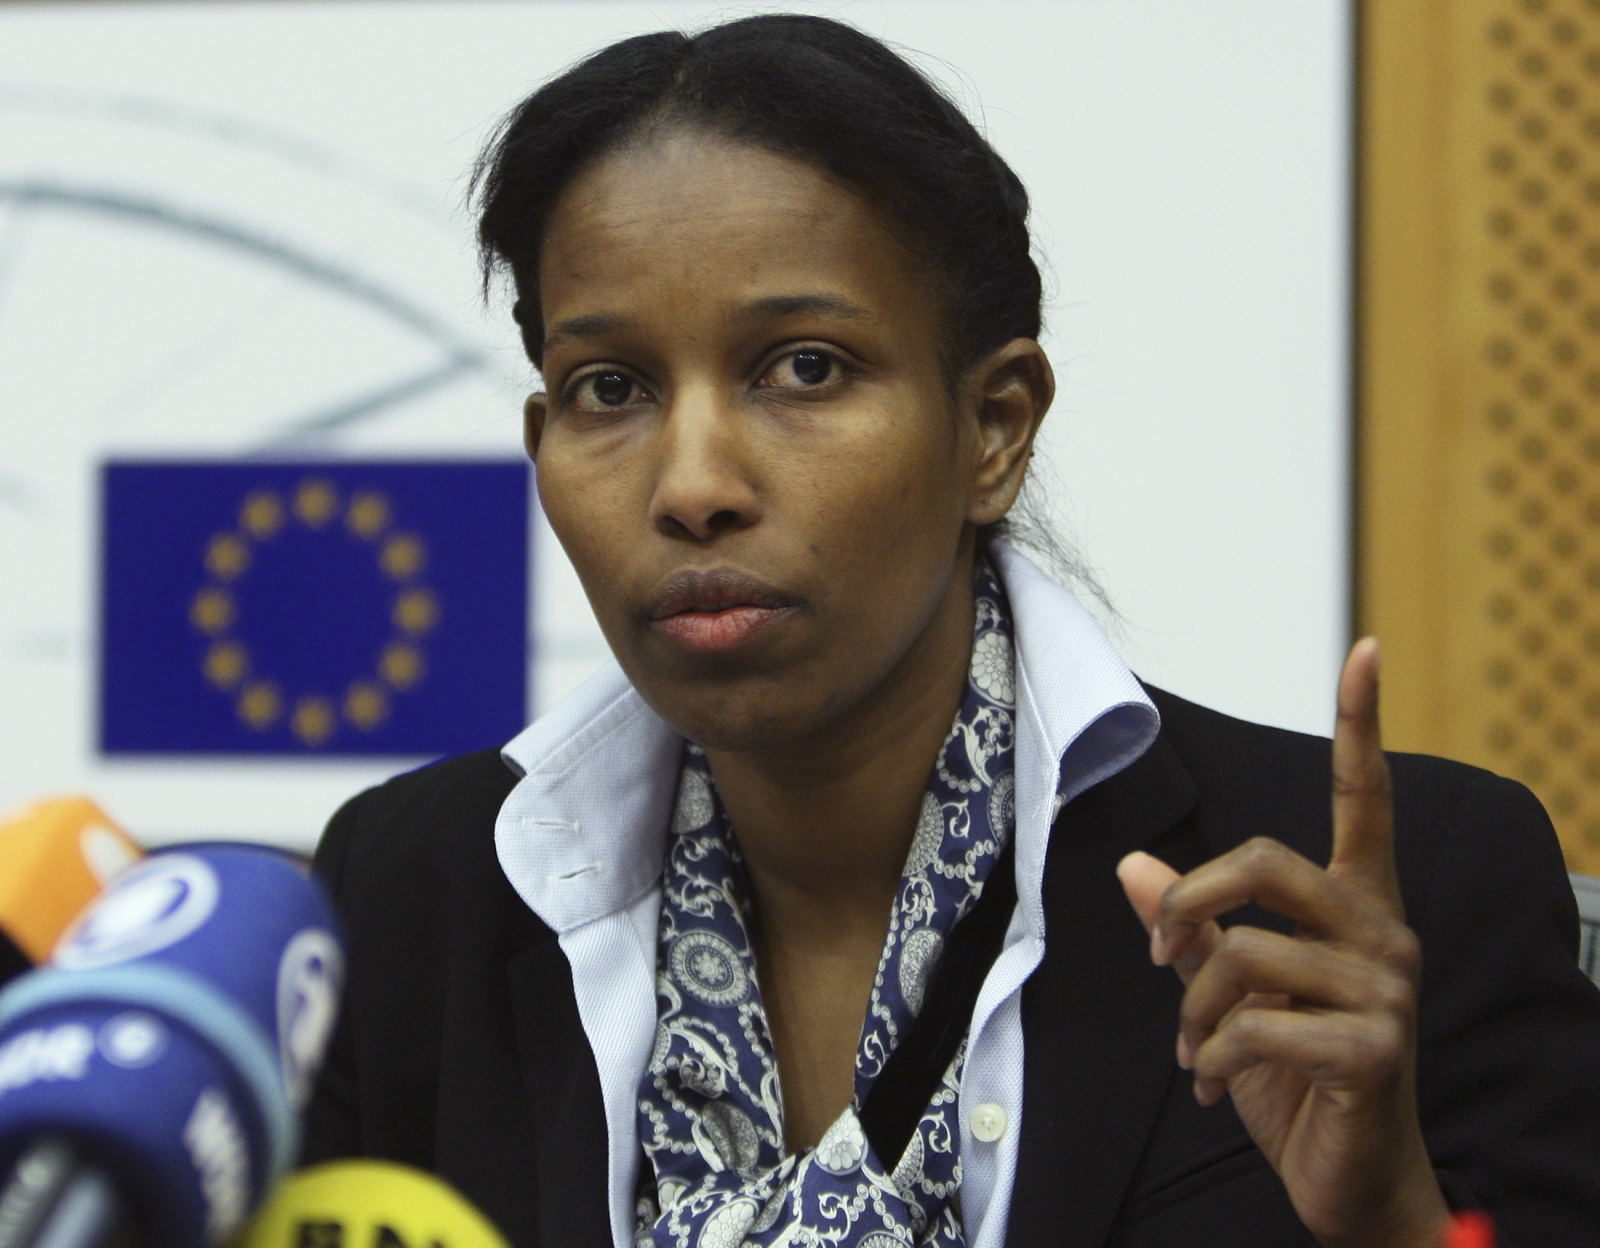 Ayaan Hirsi Ali, a former Dutch parliamentarian,